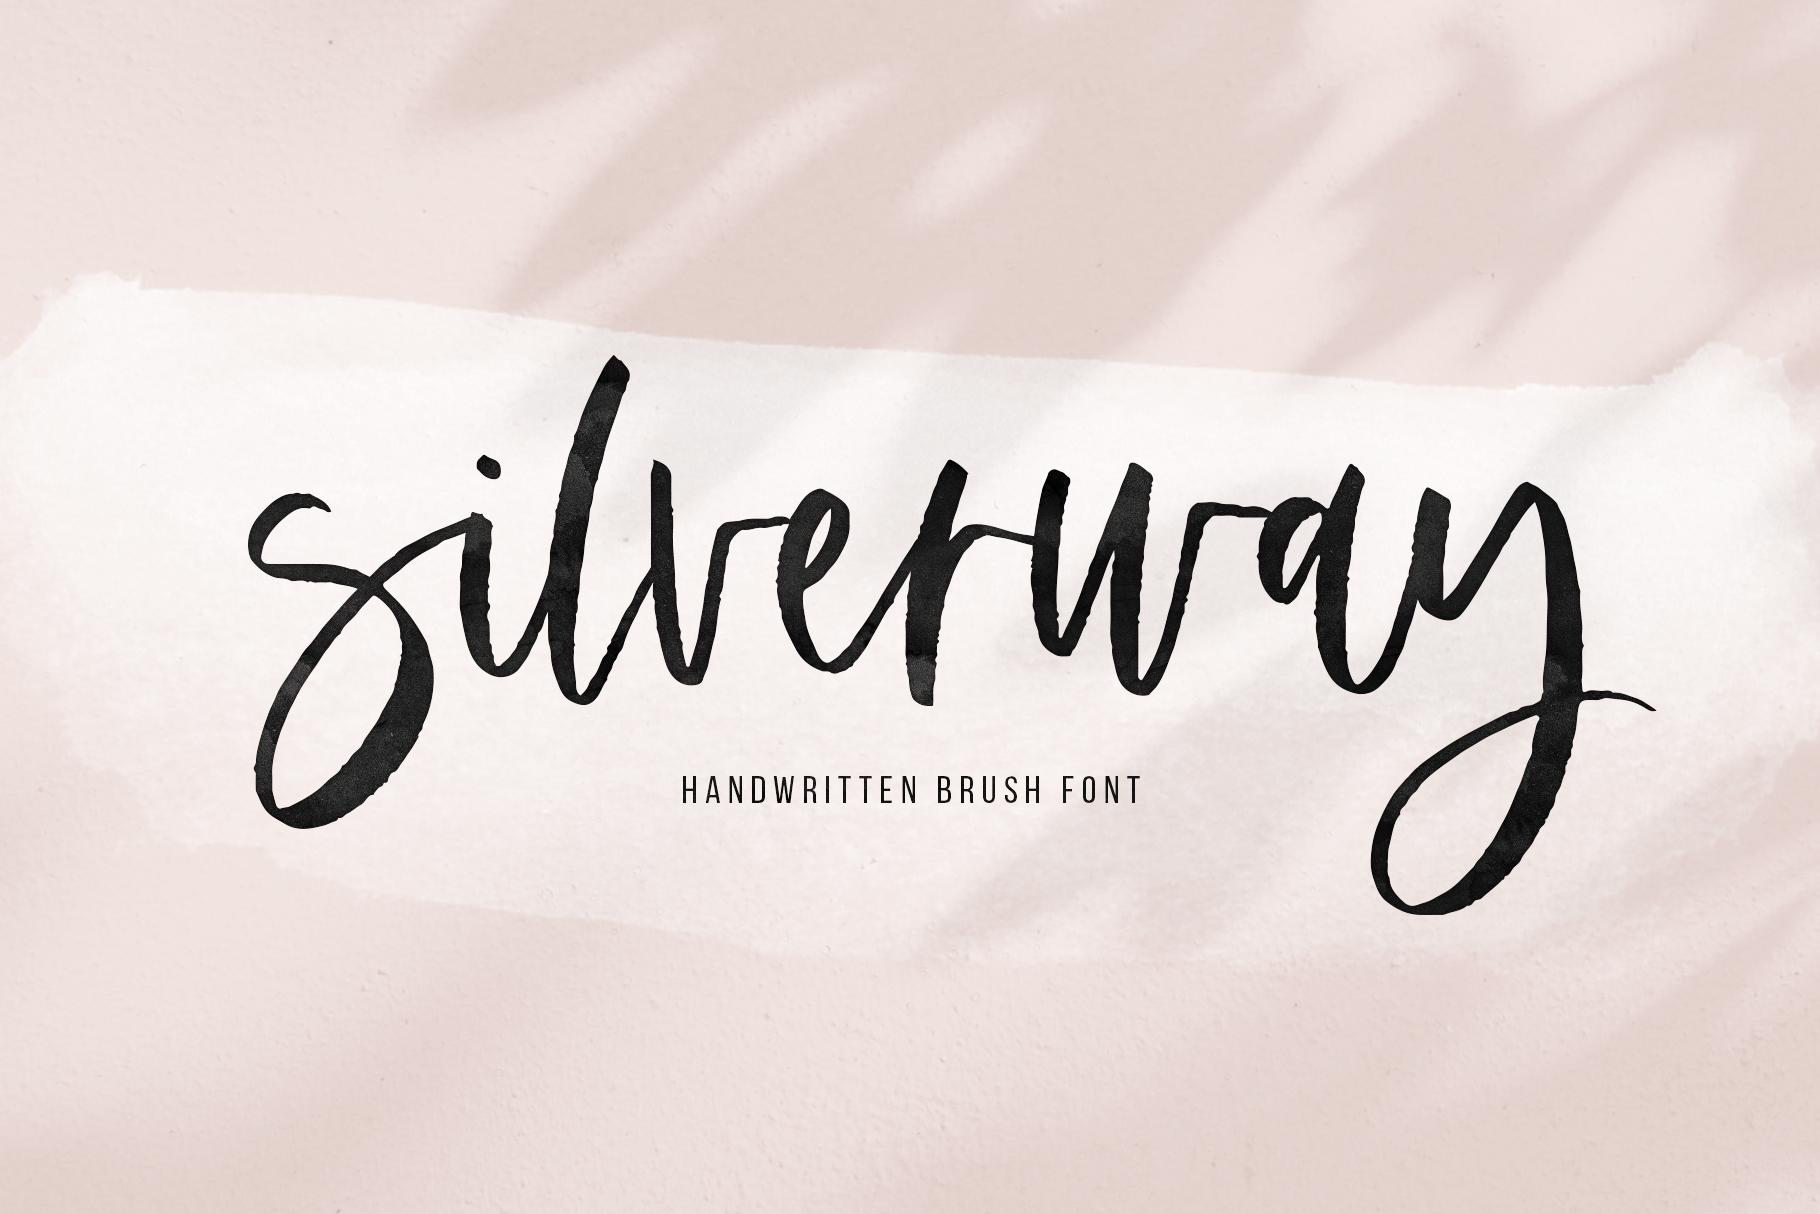 Silverway - A Modern Handwritten Script Font example image 1